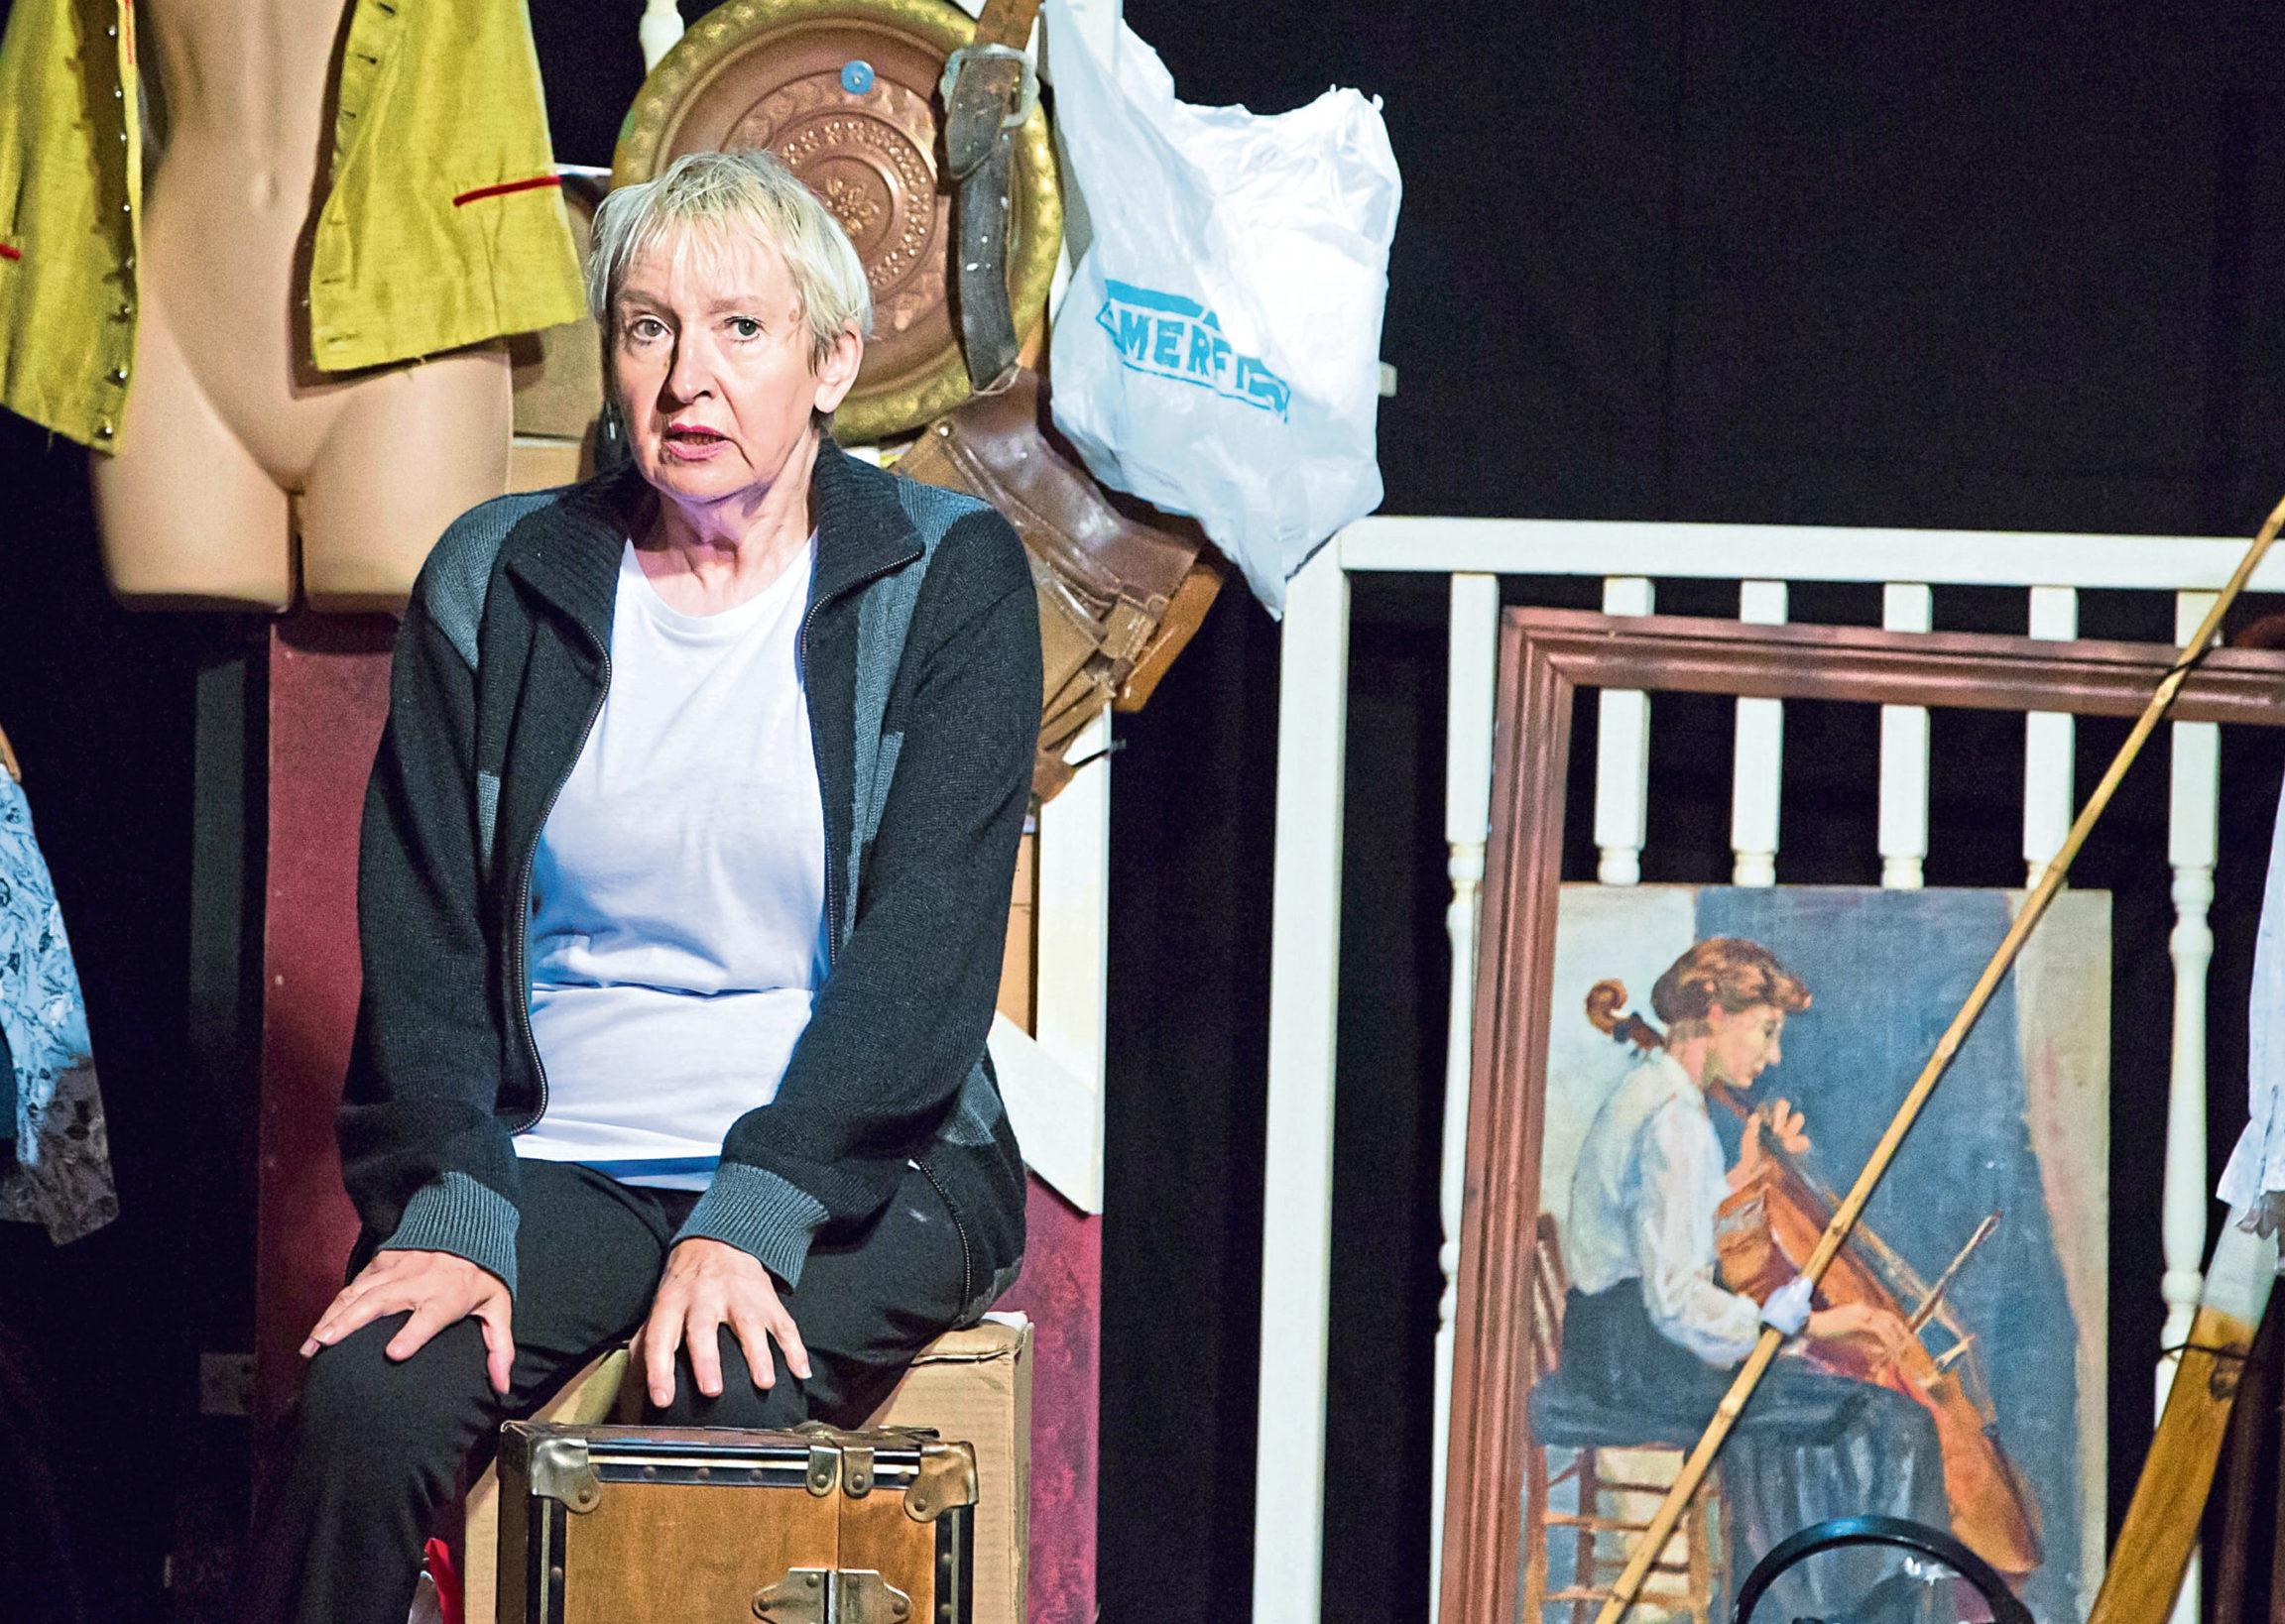 Su Pollard returns as hoarder Birdy in Fringe hit Harpy, her one-woman play